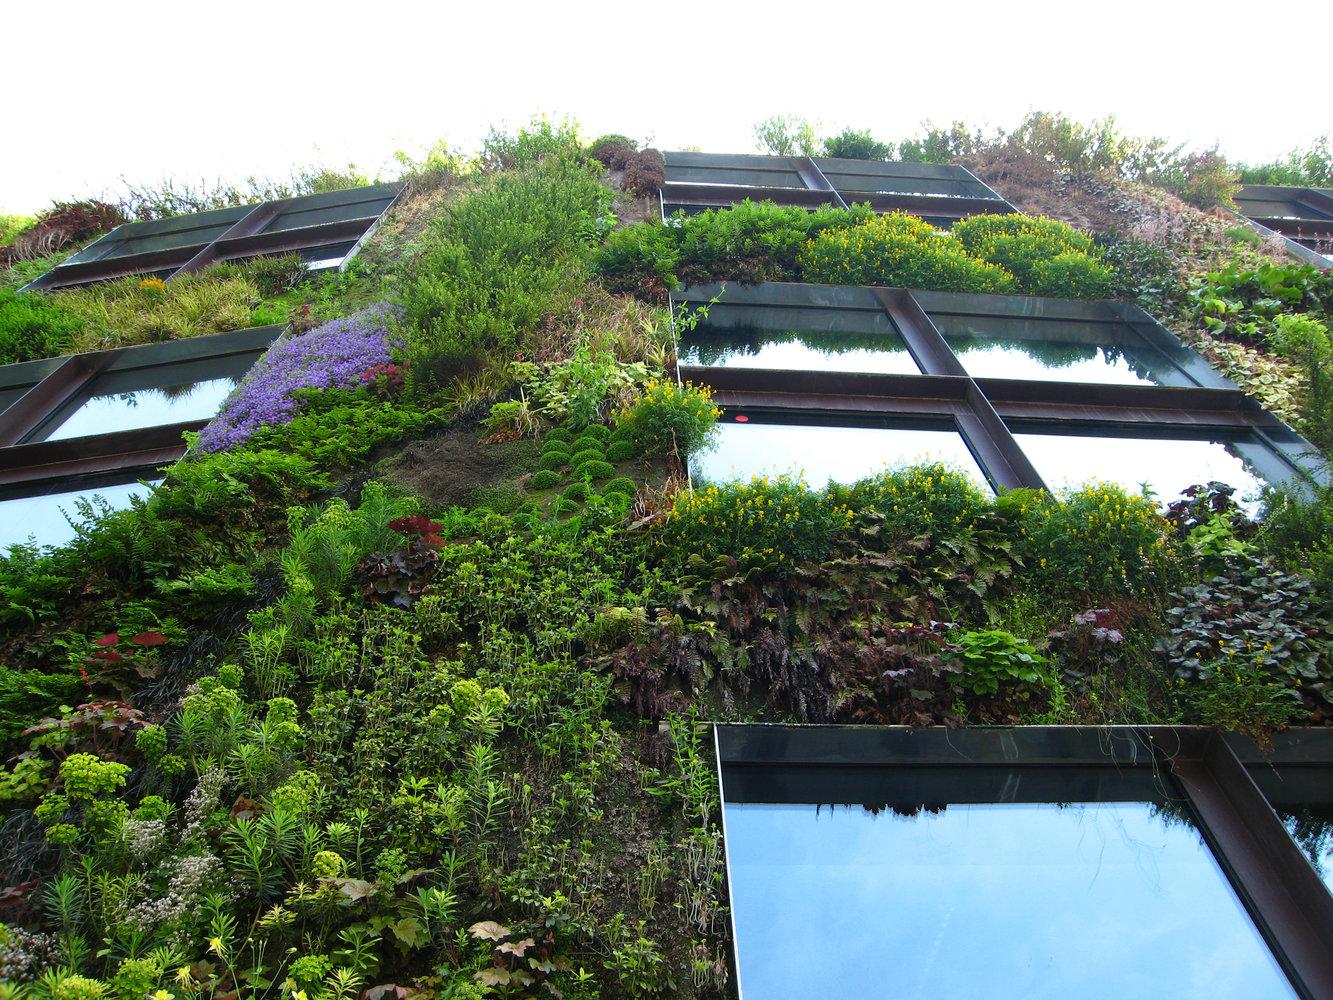 Jardín vertical de Quai Branly - Paisajismo Digital